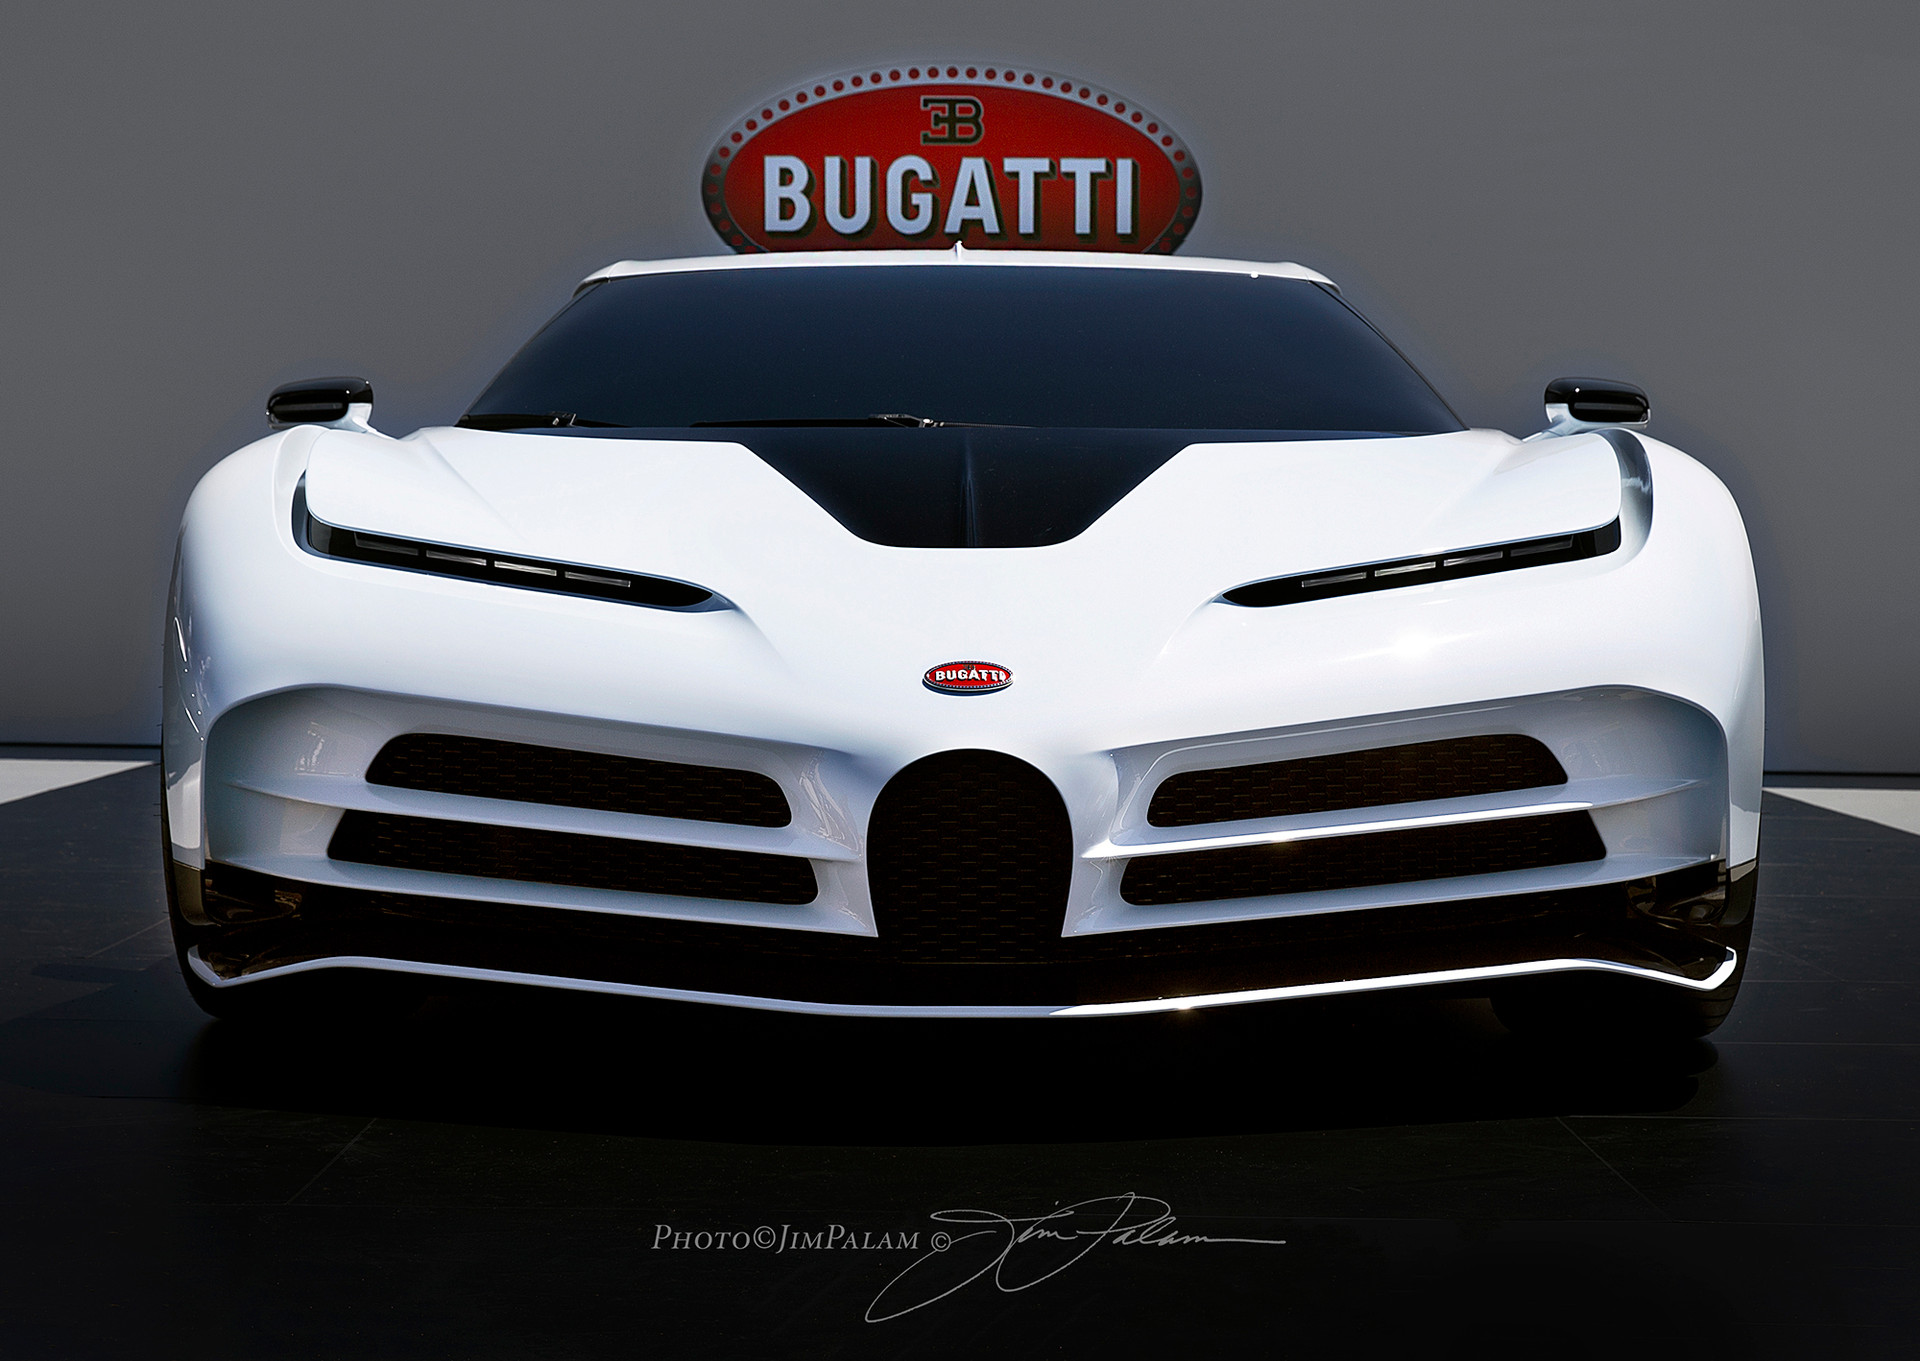 Bugatti_NewAtTheQuail_2019_r1.jpg